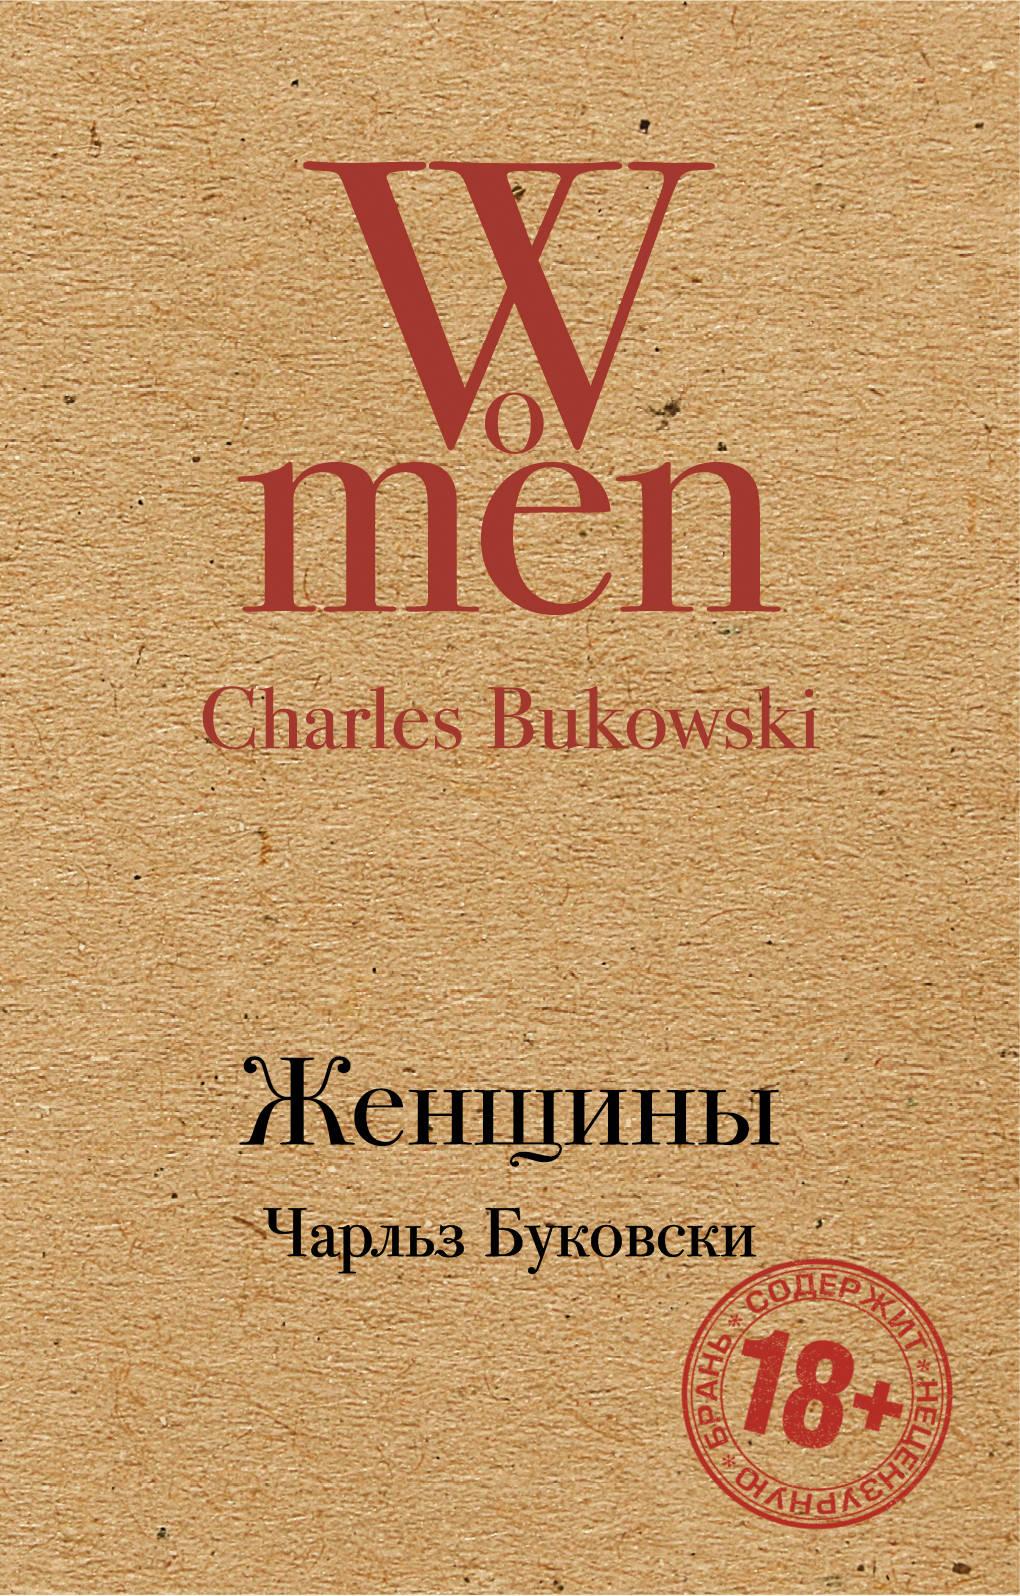 Чарльз Буковски Женщины ISBN: 978-5-699-97339-2 футболка стрэйч printio чарльз буковски charles bukowski